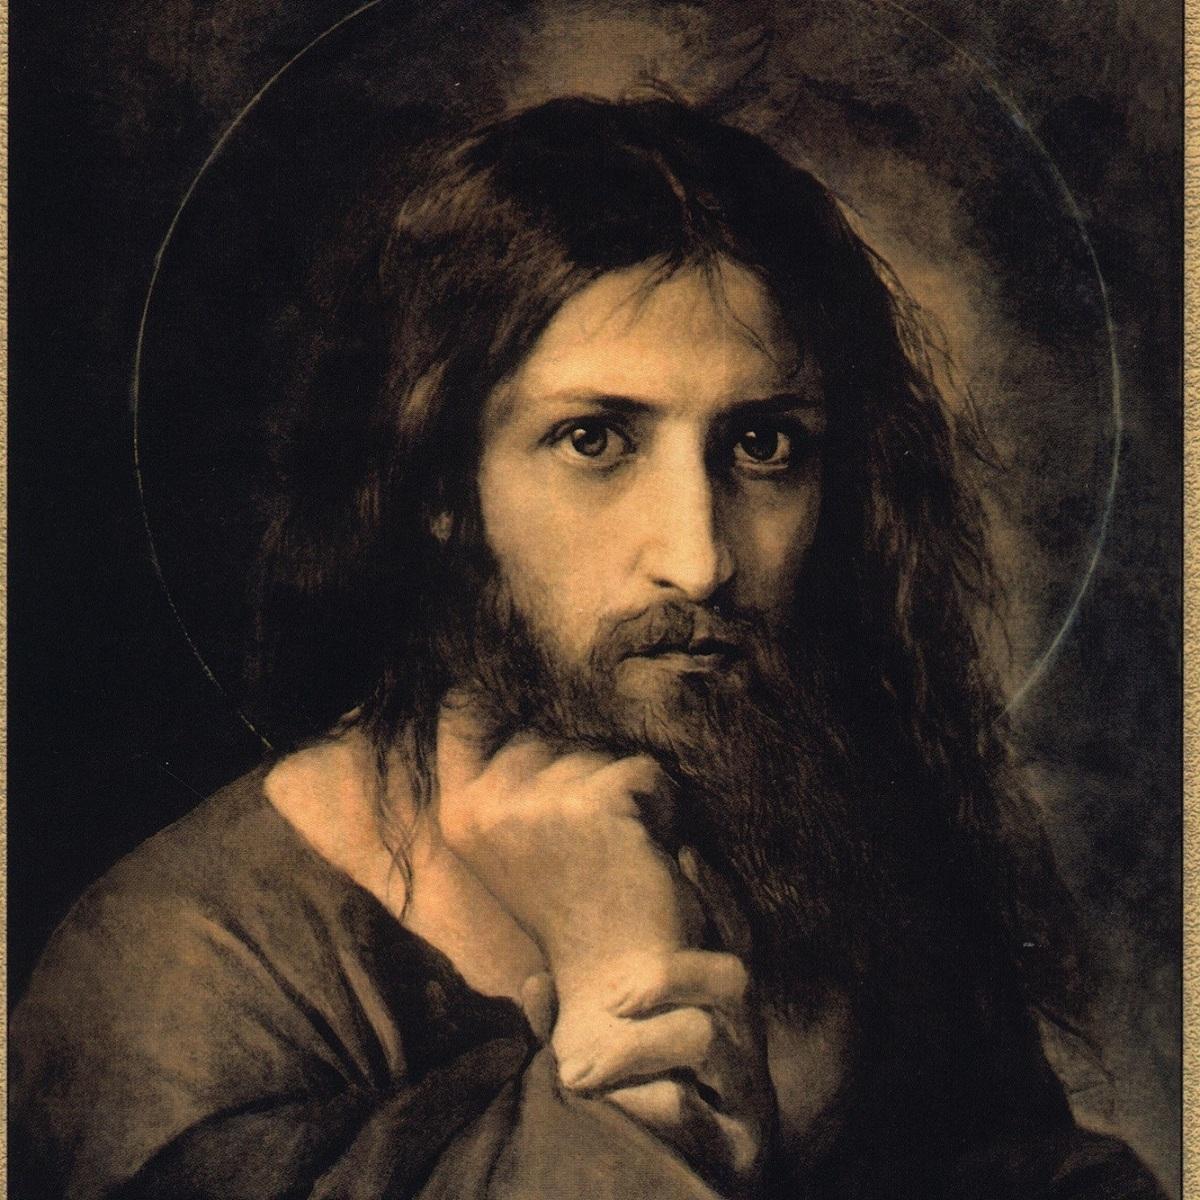 Jesus the activist